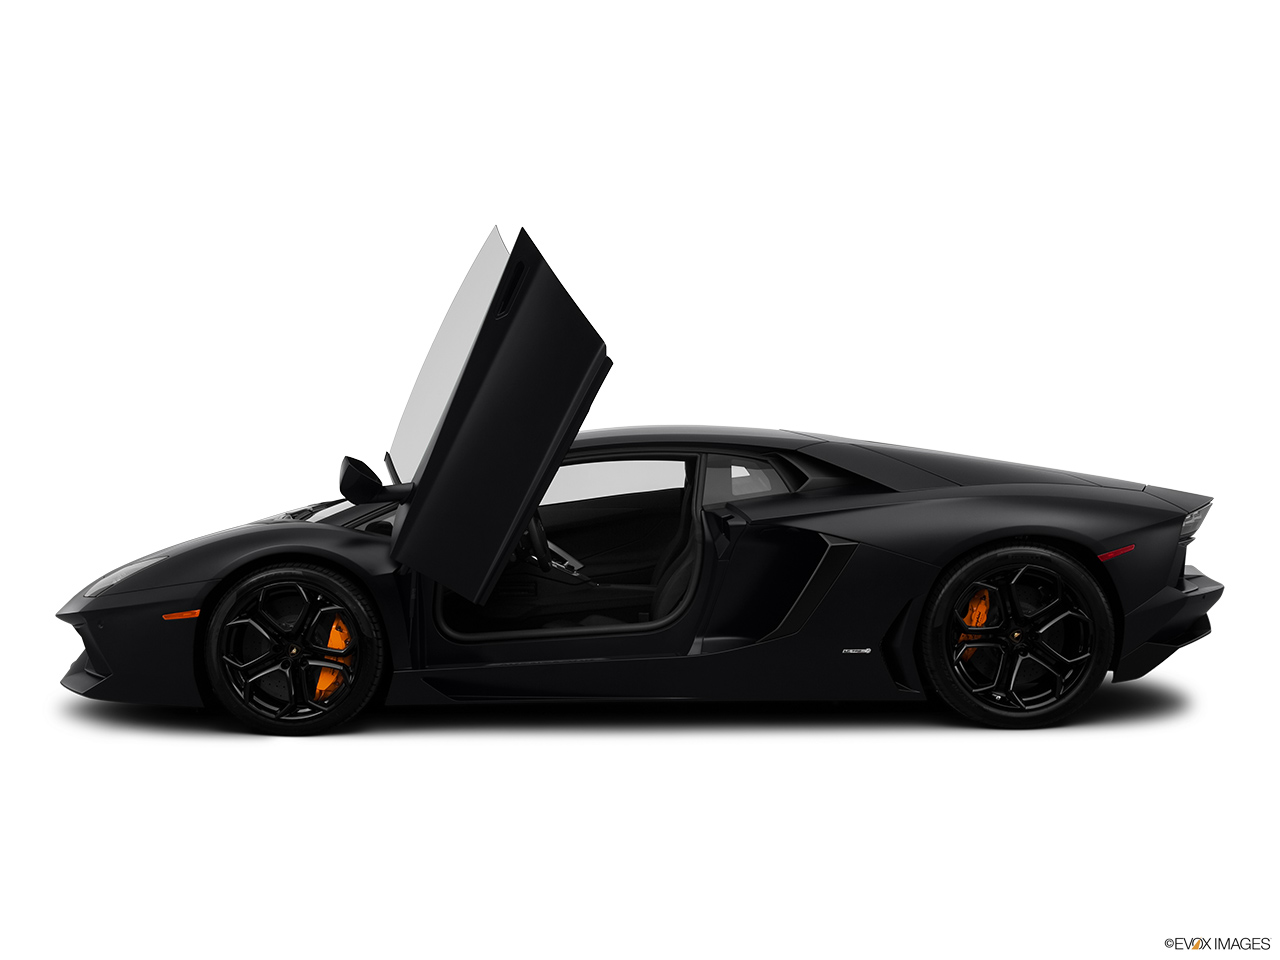 2015 Lamborghini Aventador Coupe Front Angle View 2015